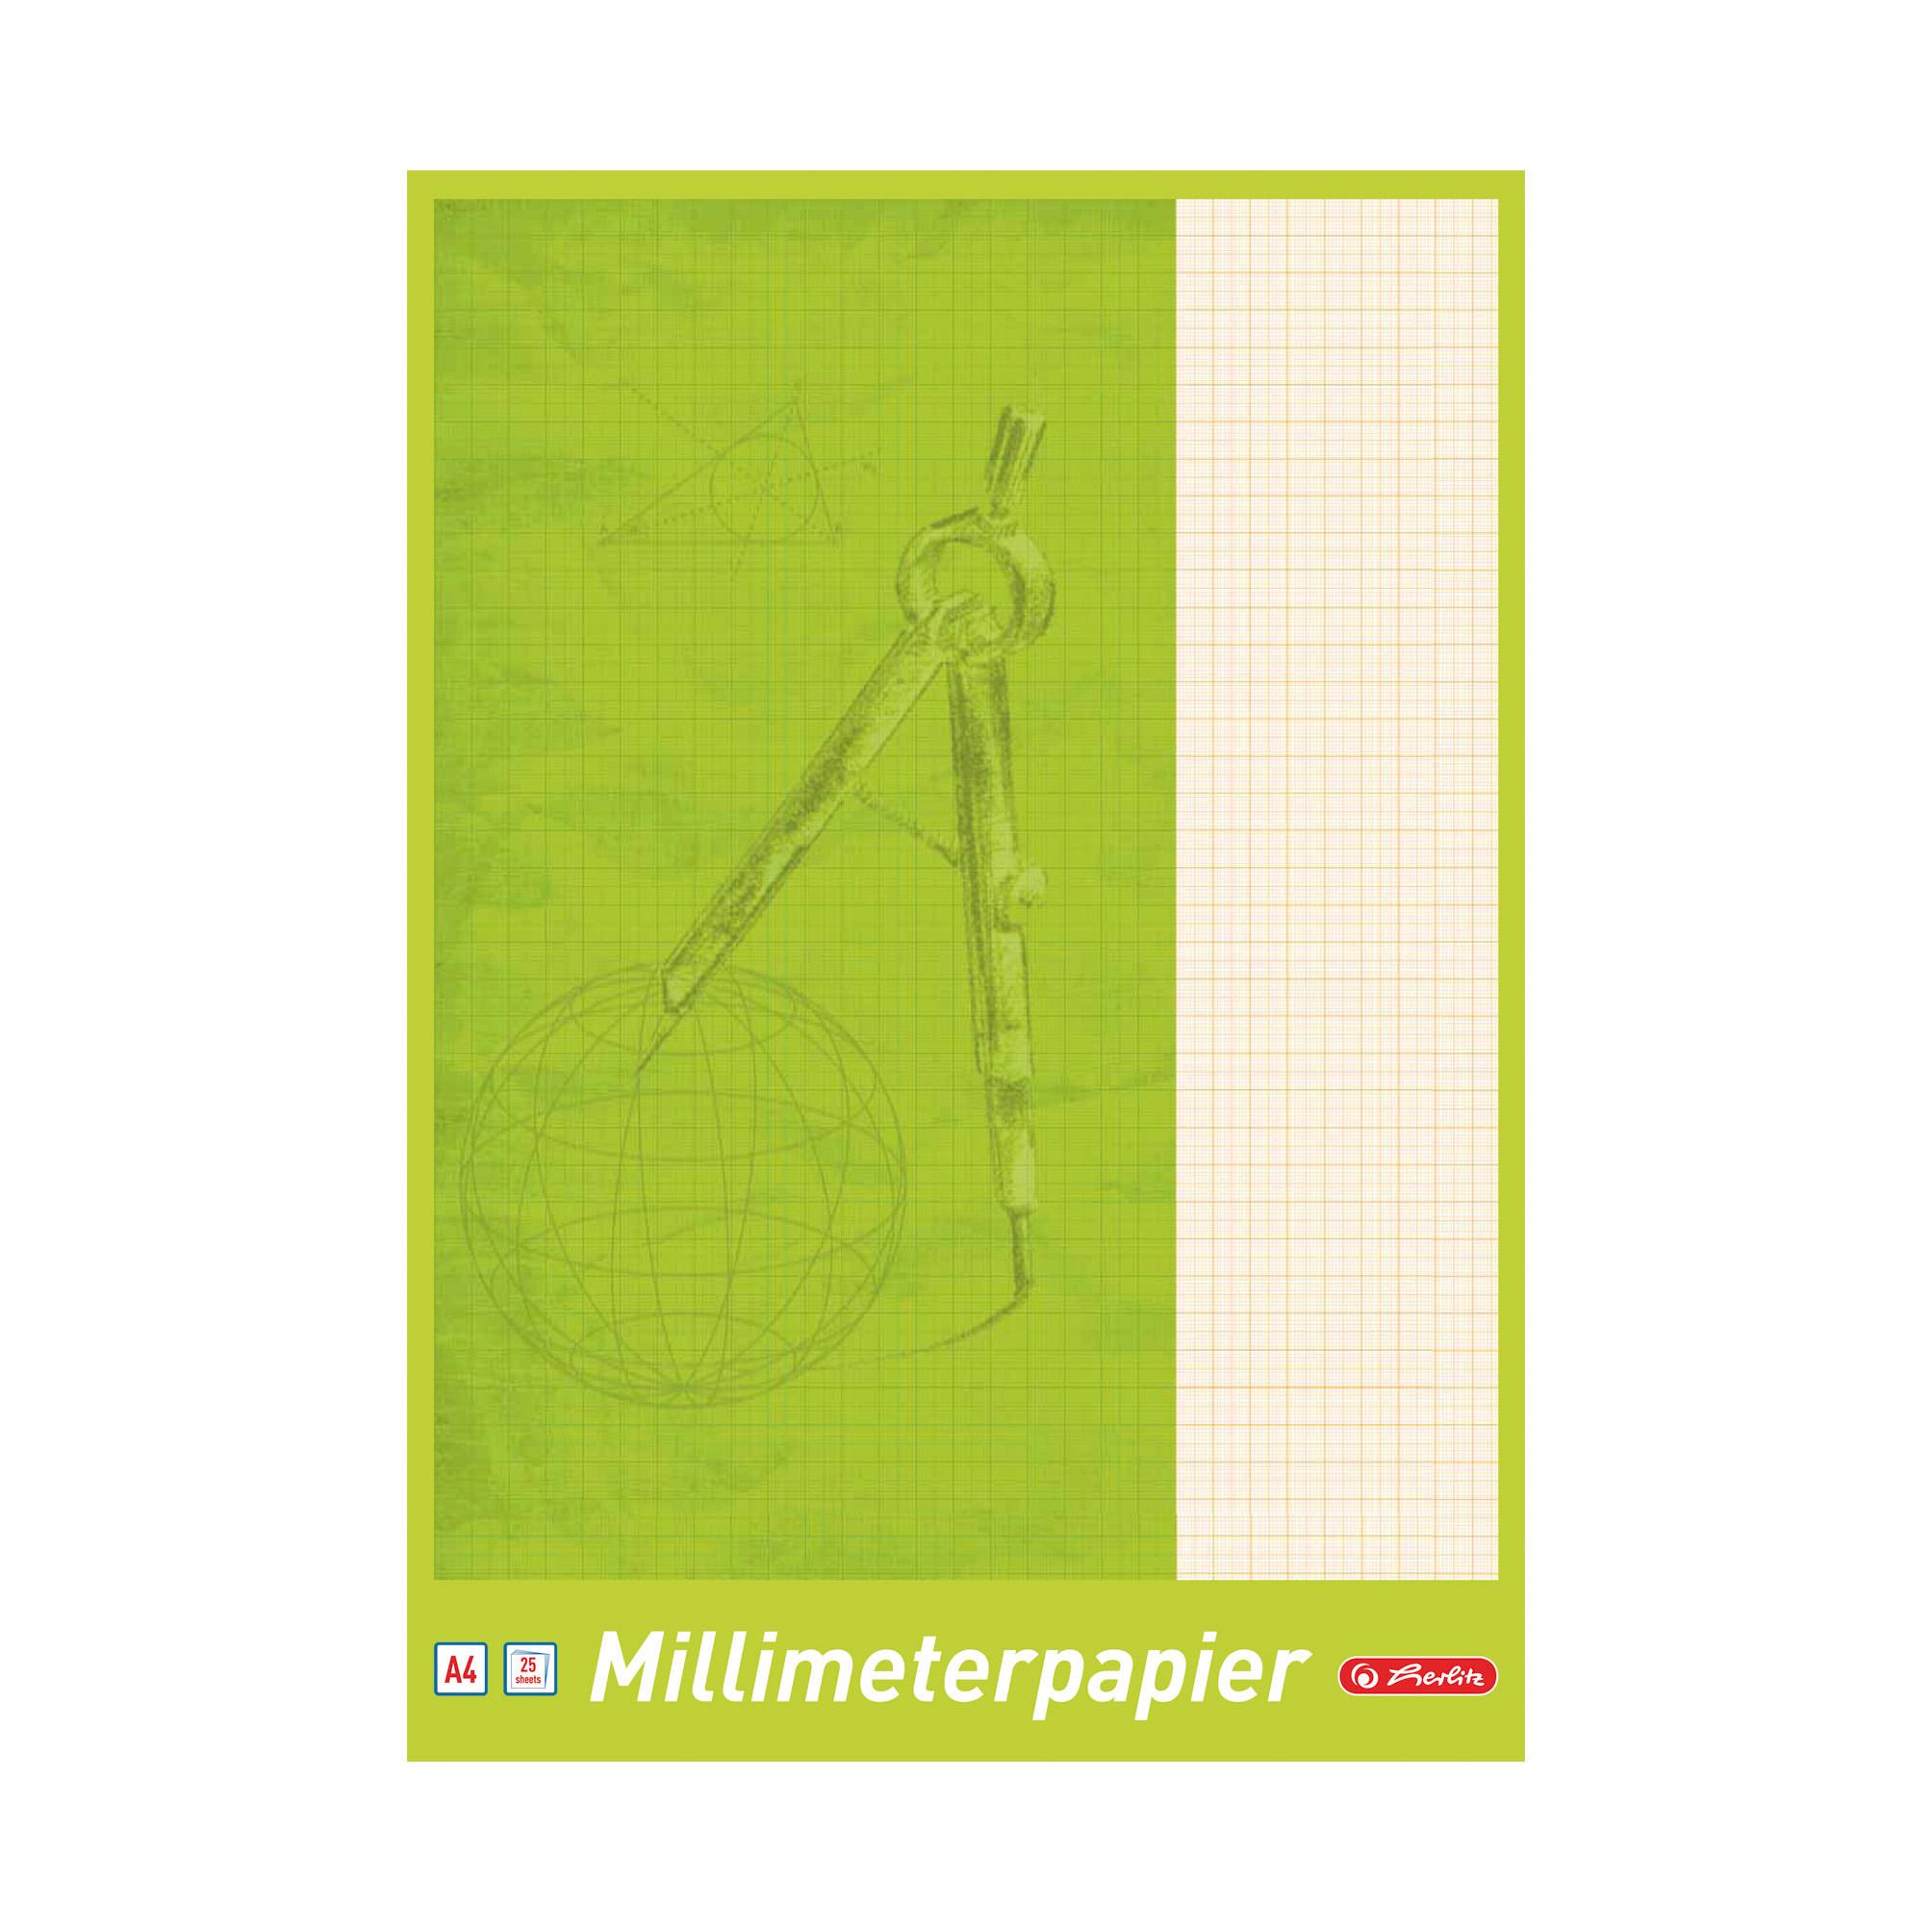 Herlitz Millimeterpapier 25 Blatt Din A4 Ebay